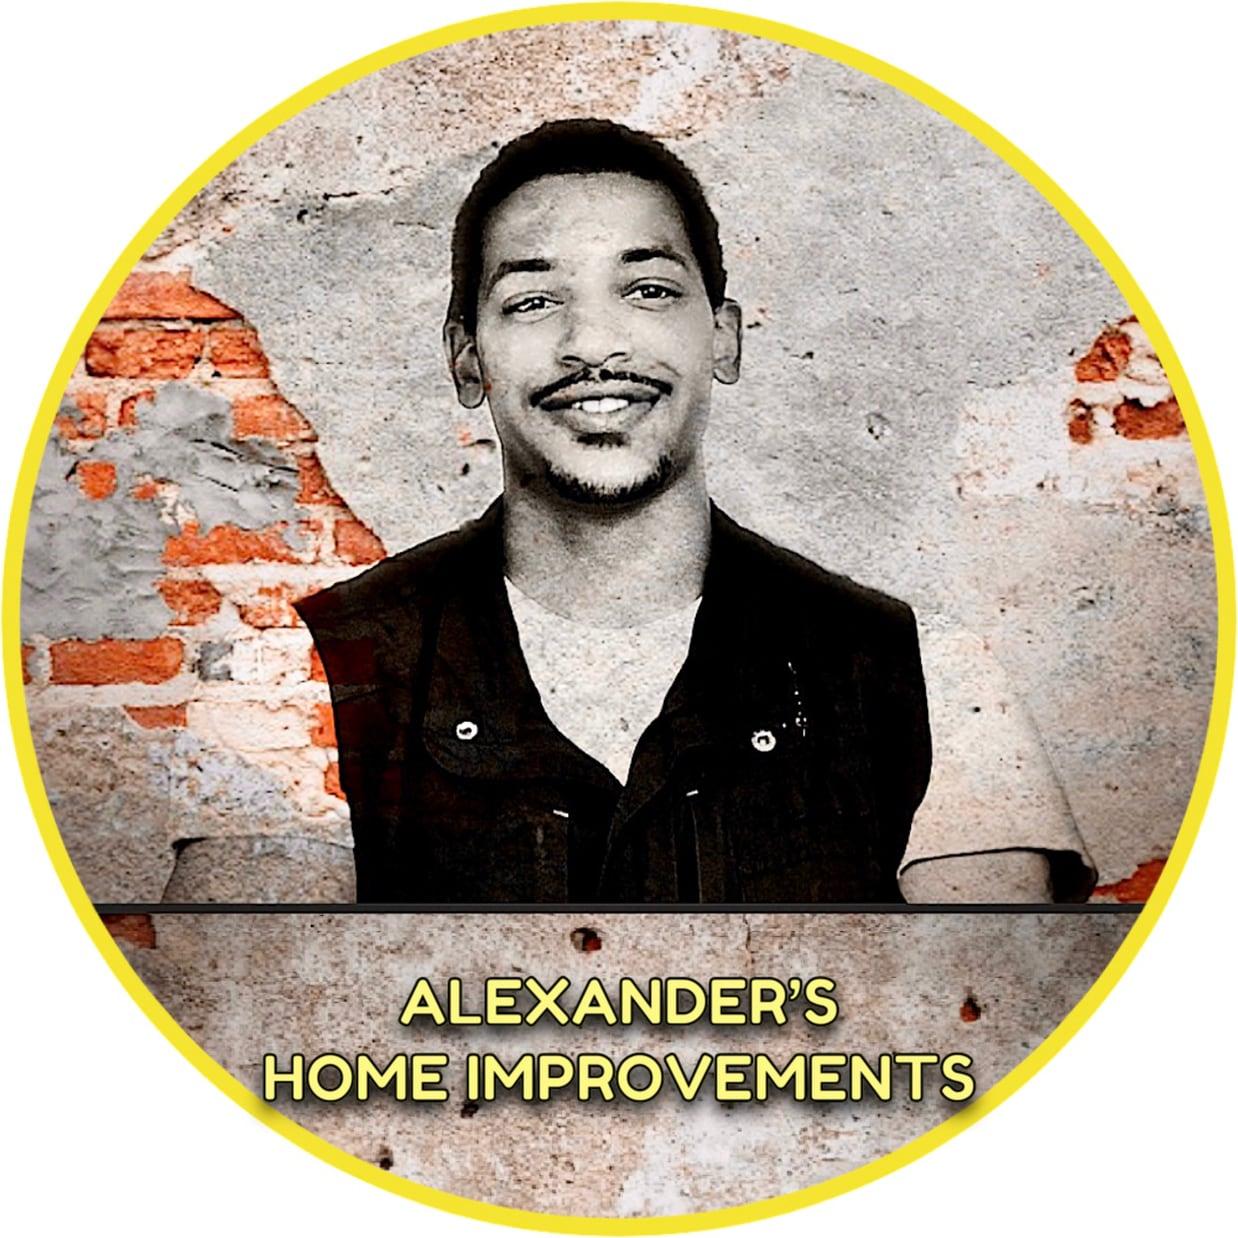 Alexander's Home Improvements logo